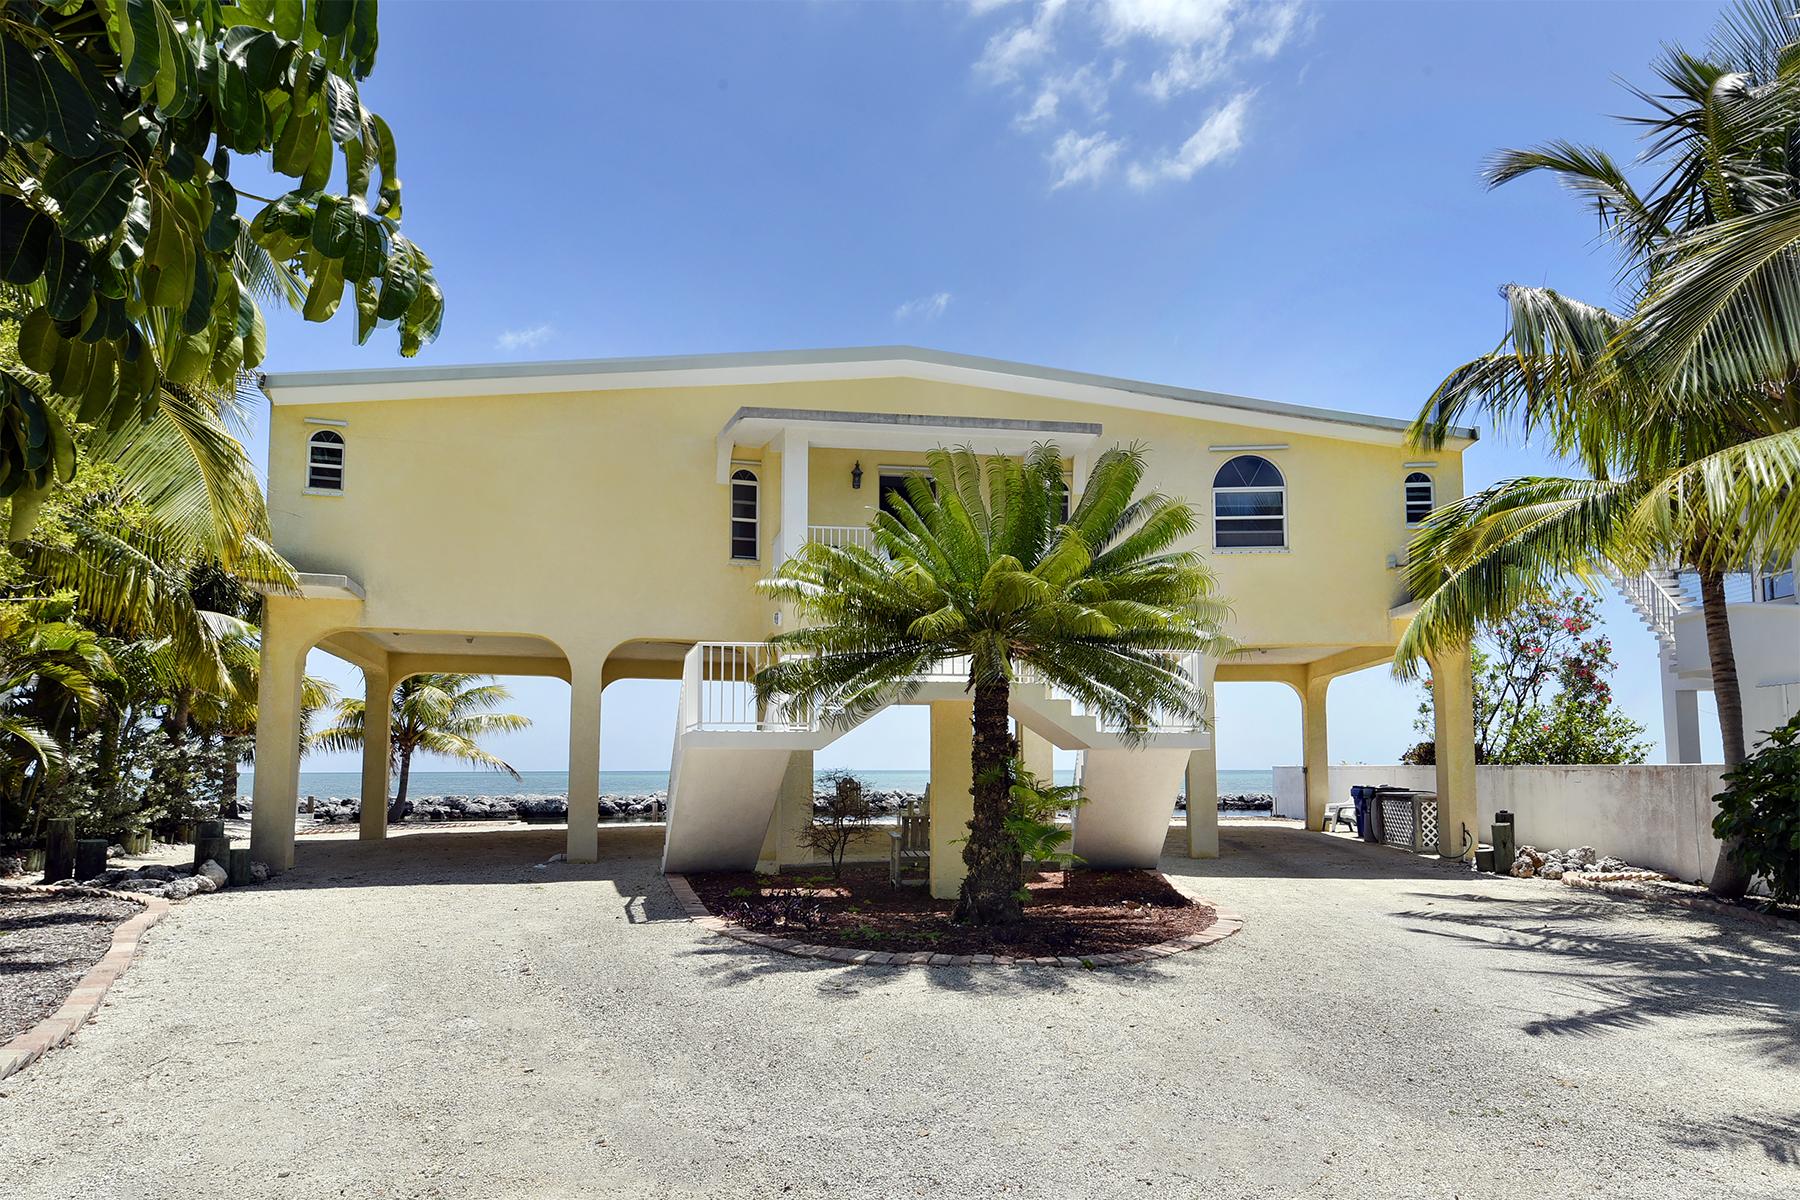 Additional photo for property listing at Sweeping Ocean Views 208 Plantation Shores Drive Islamorada, Florida 33070 Estados Unidos